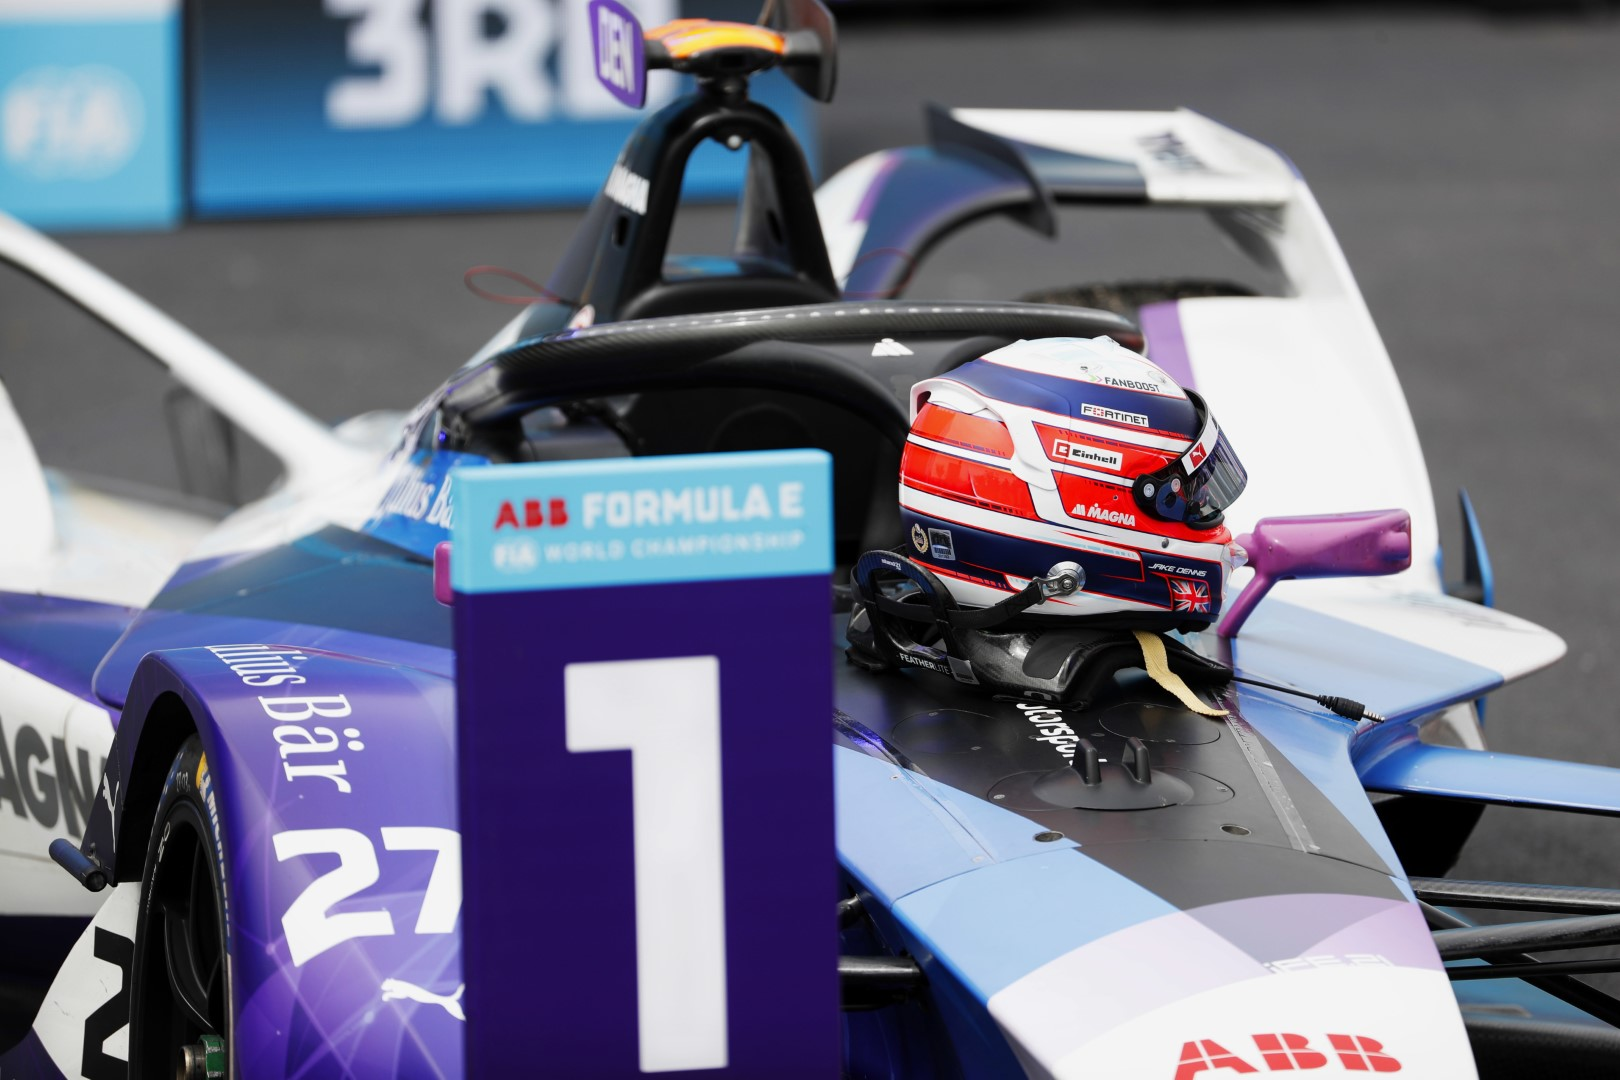 Jake Dennis FIA Formula E 2021 BMW iAndretti Helmet Design